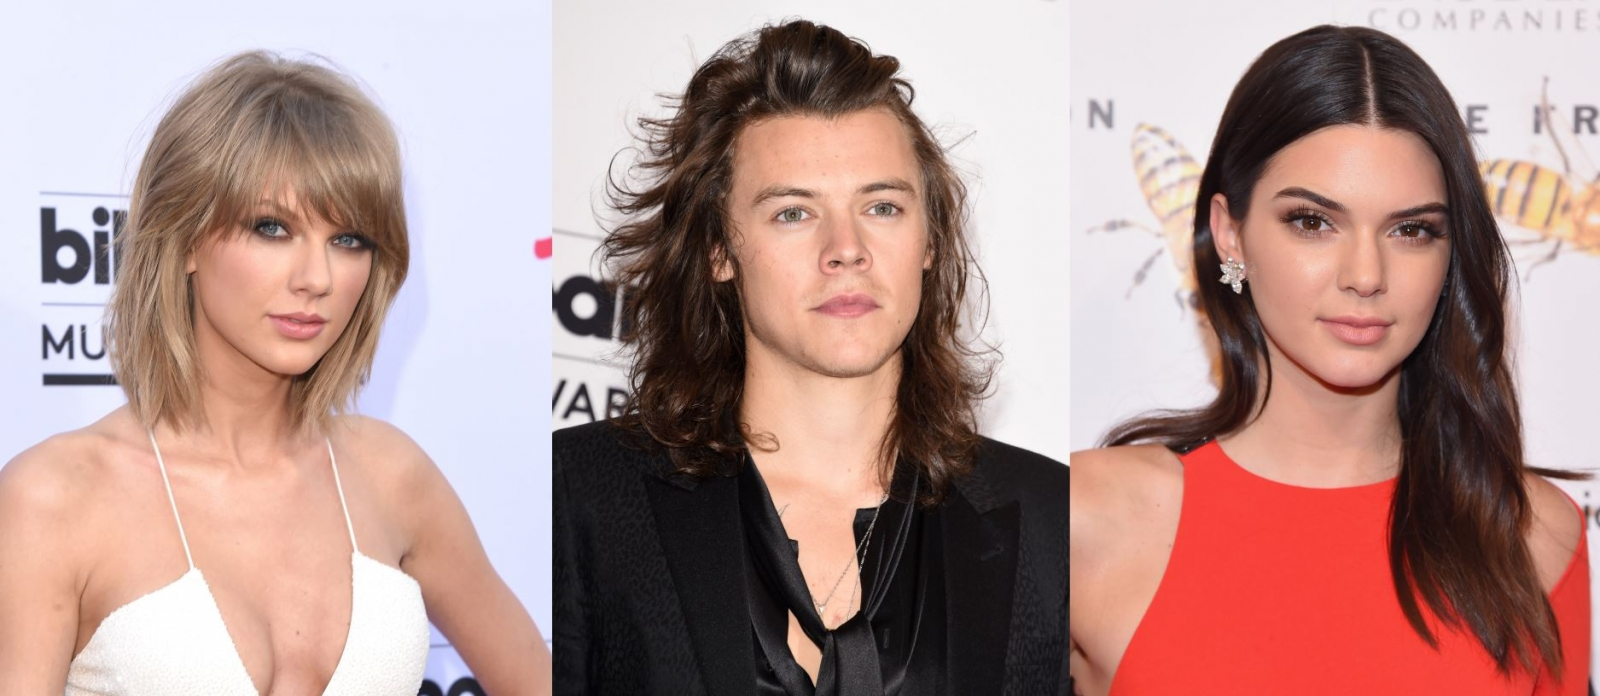 Taylor Swift Kendall Jenner Harry Styles